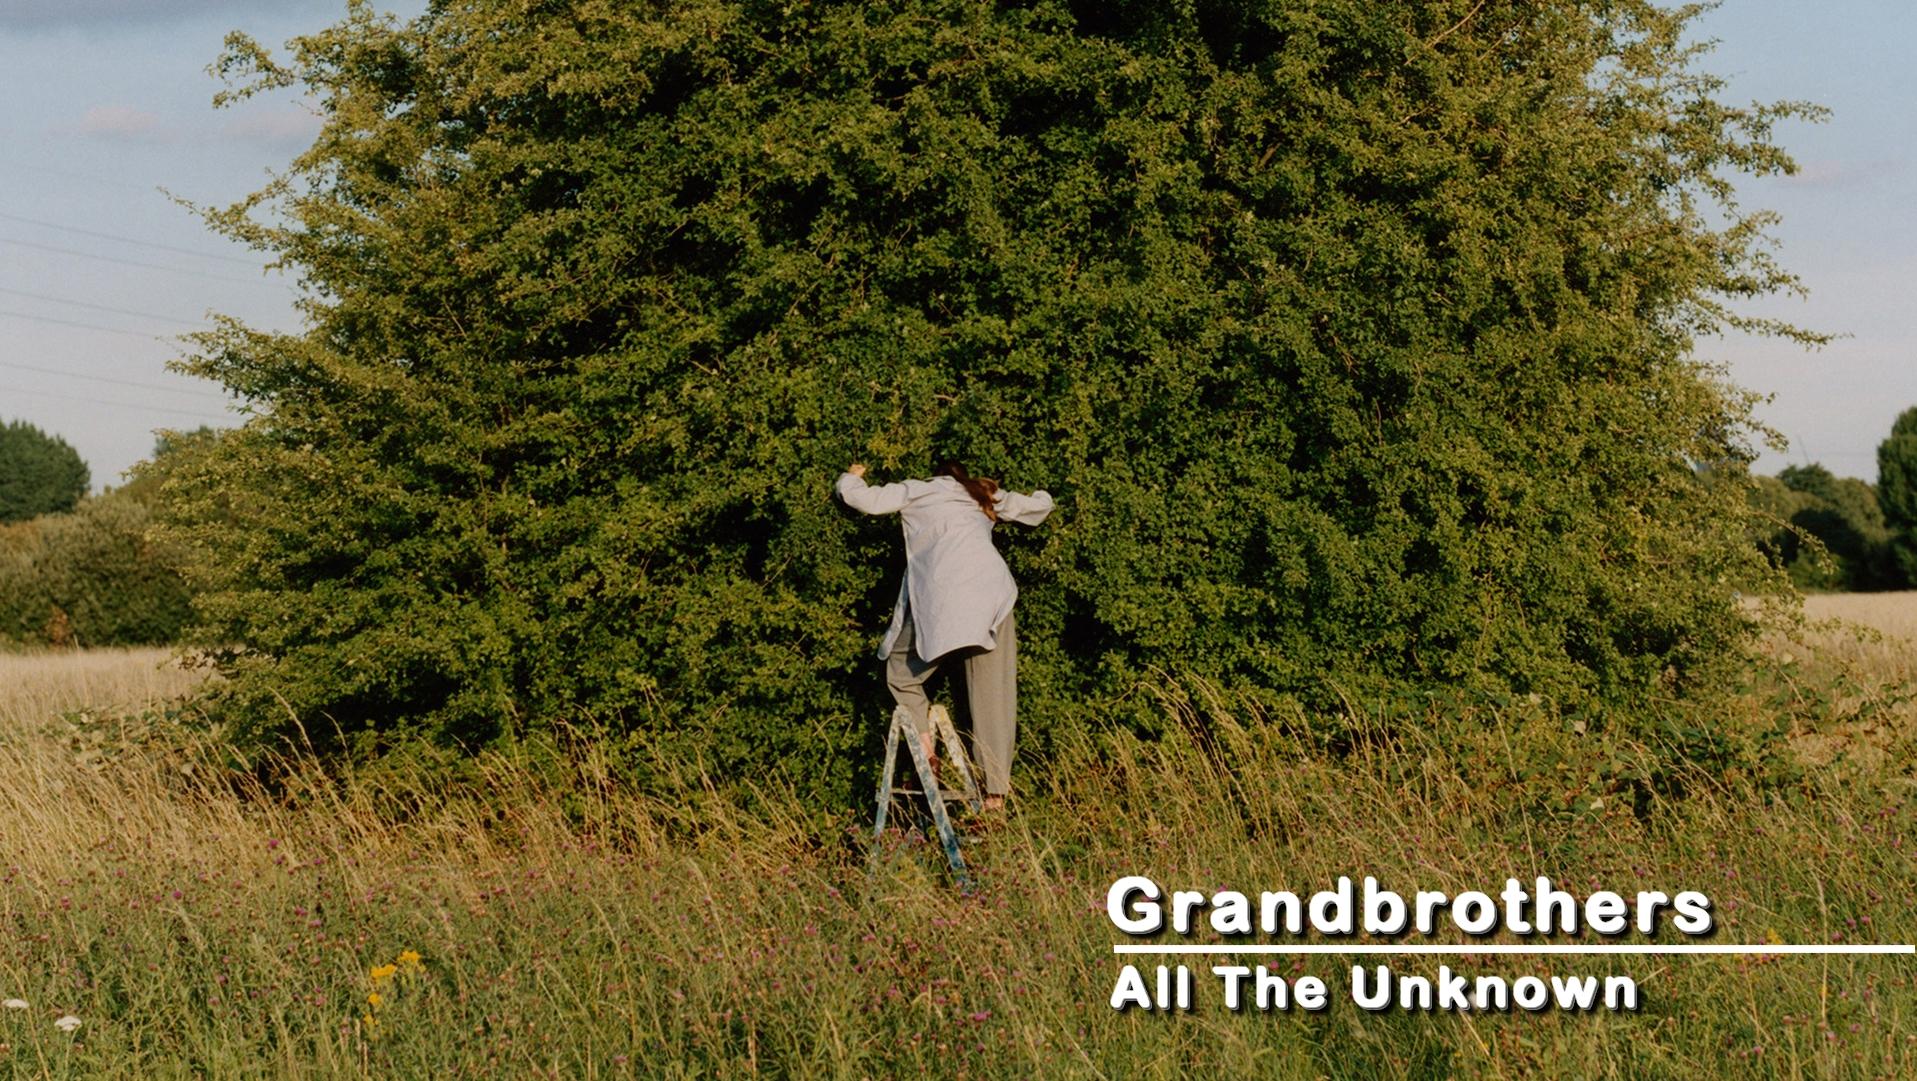 Grandbrothers